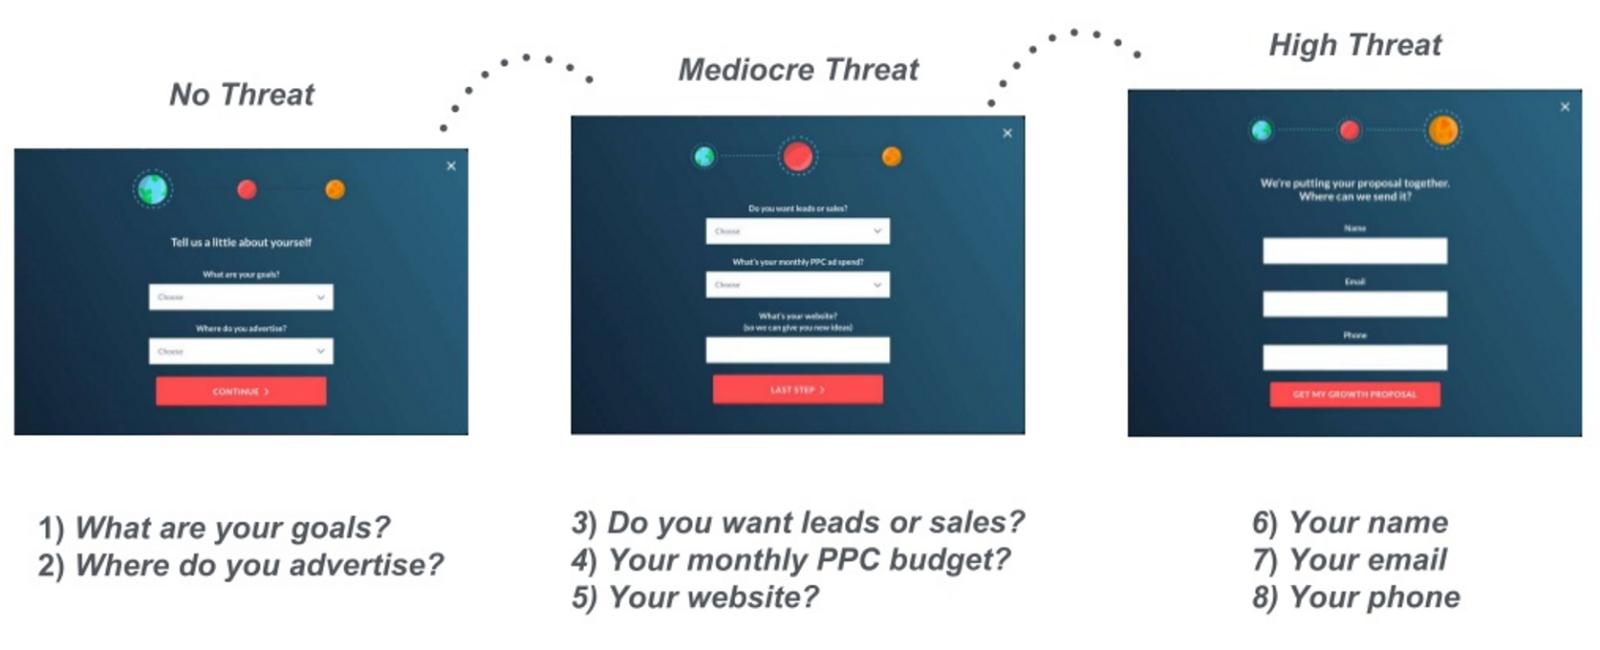 threat levels